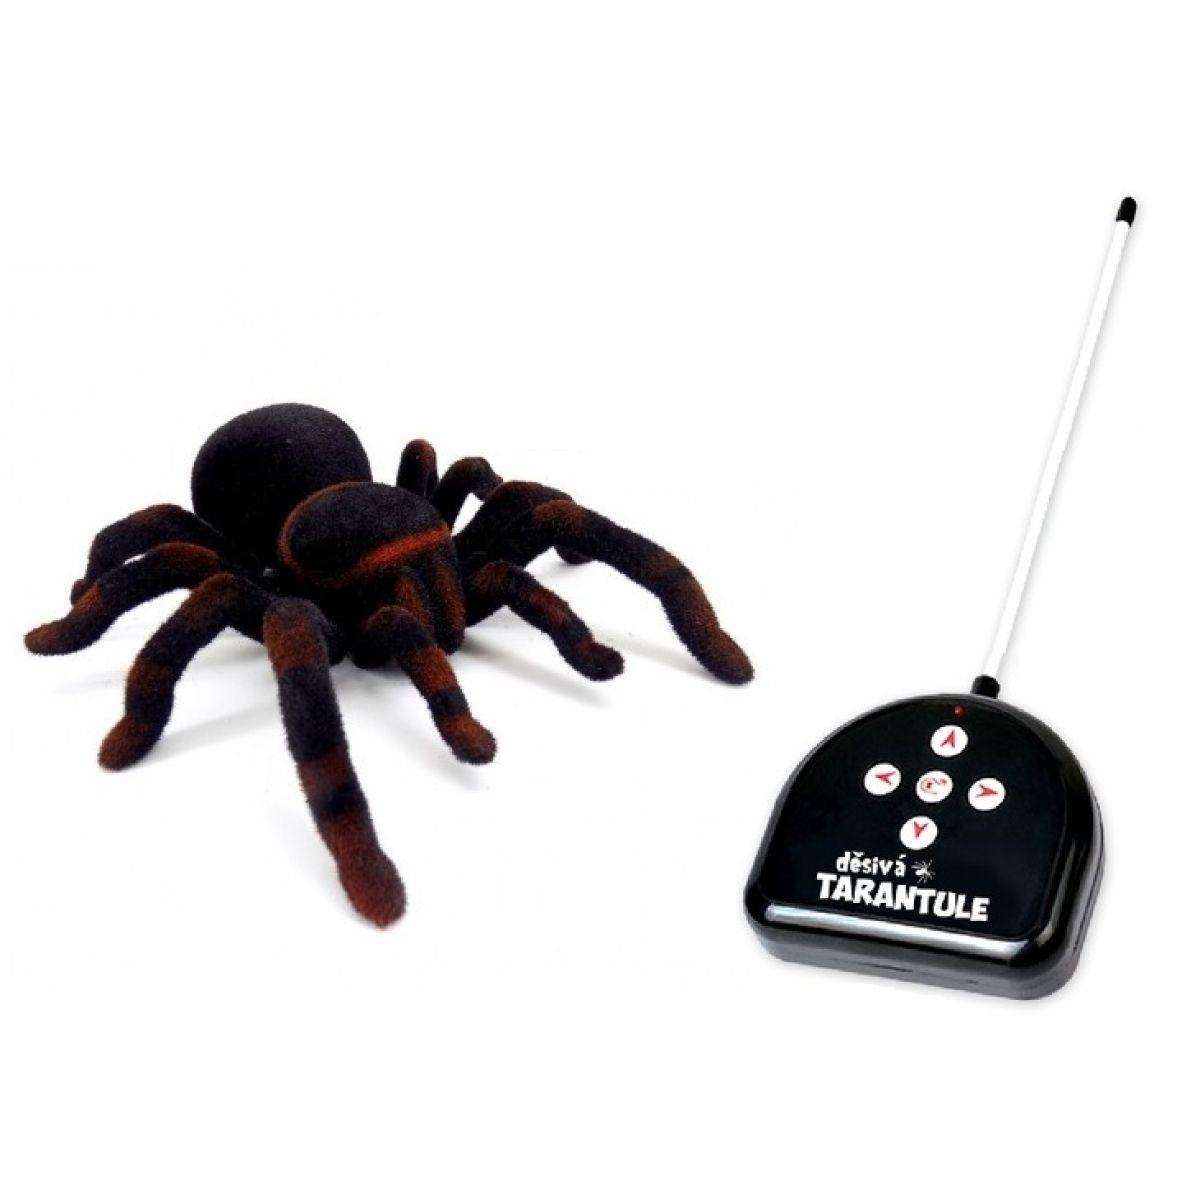 Wiky RC Děsivá tarantule